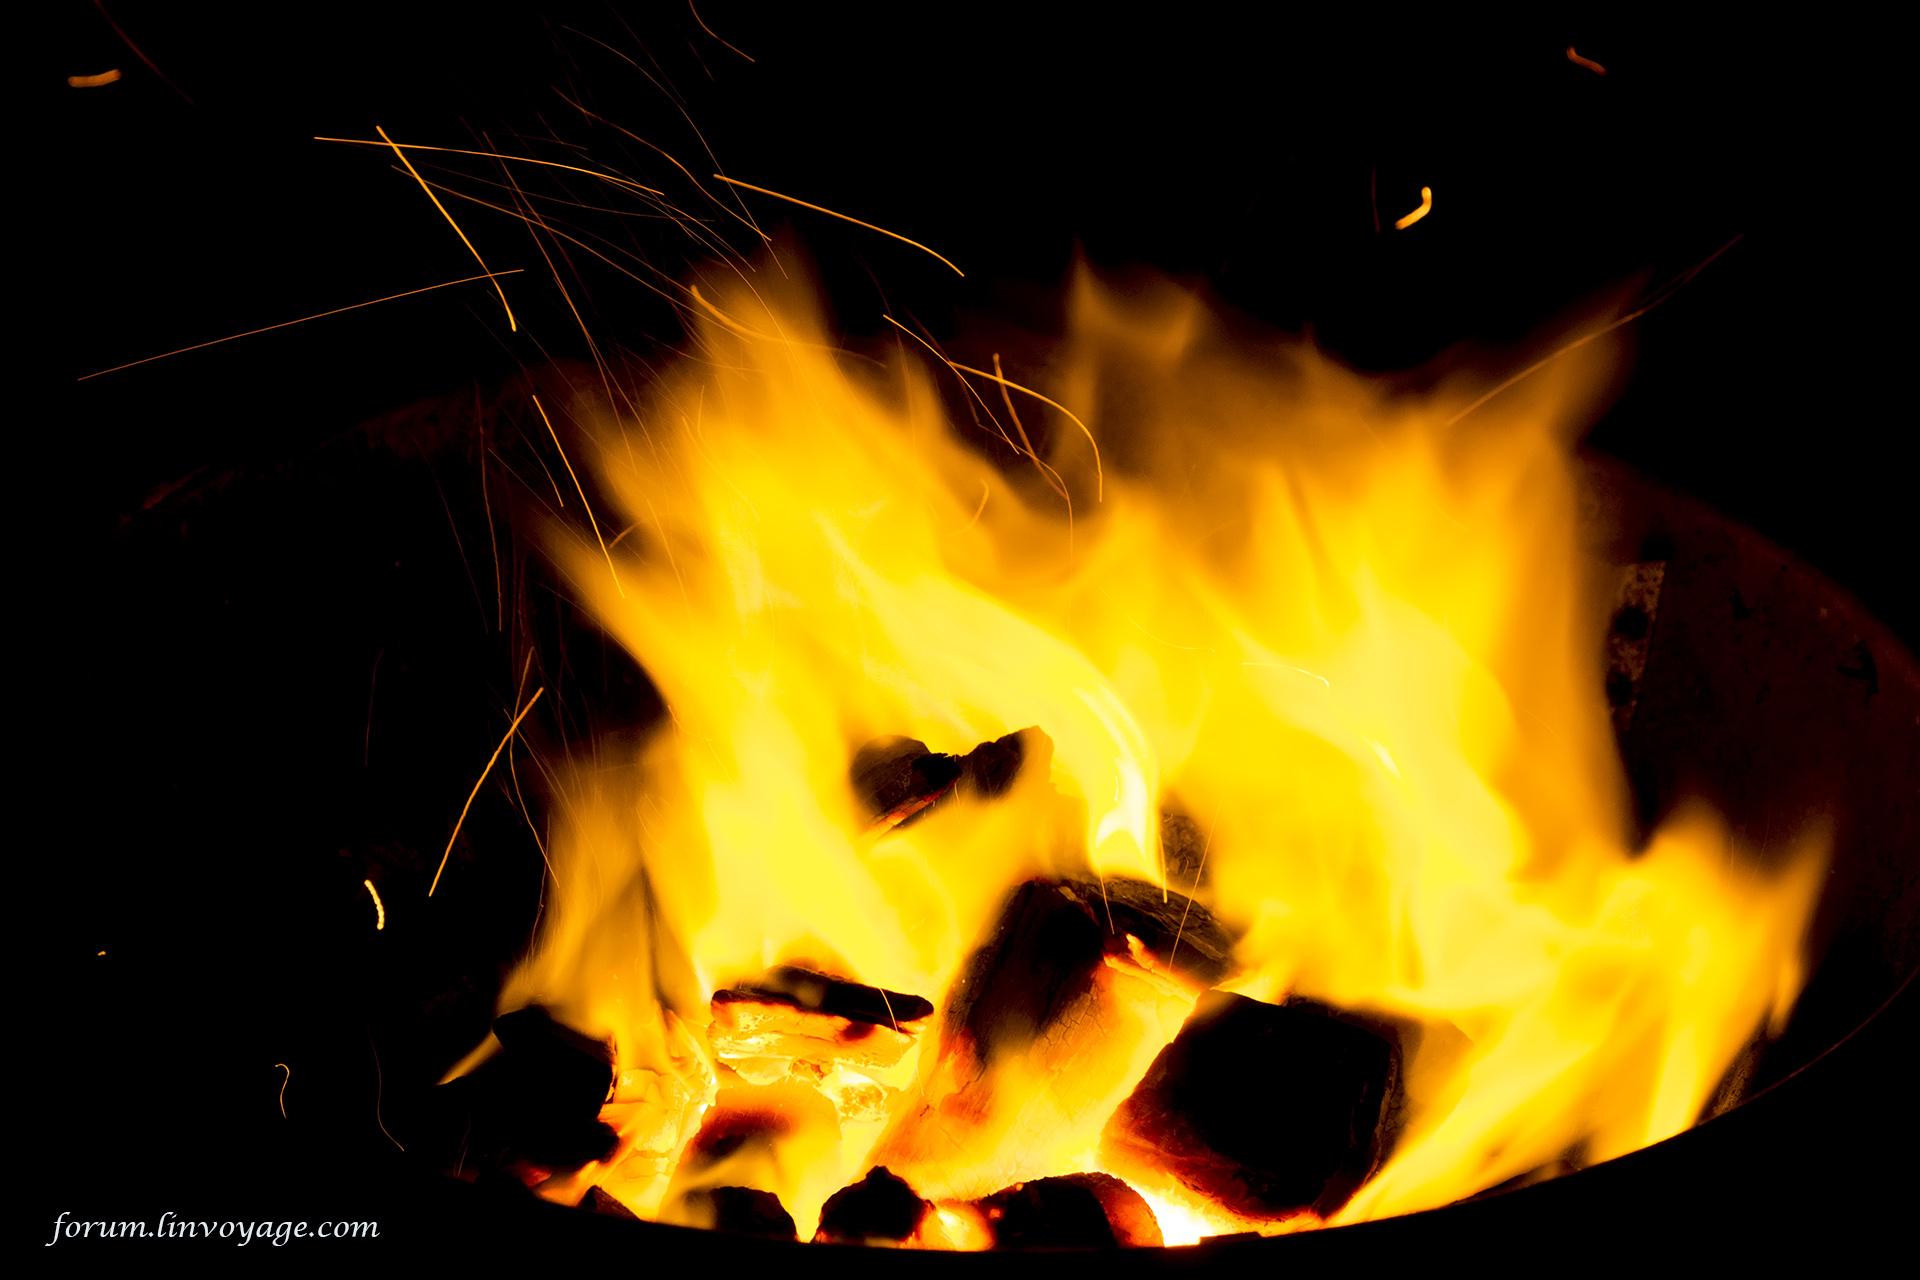 Wallpaper : black, night, fire, campfire, spark, color, outdoor